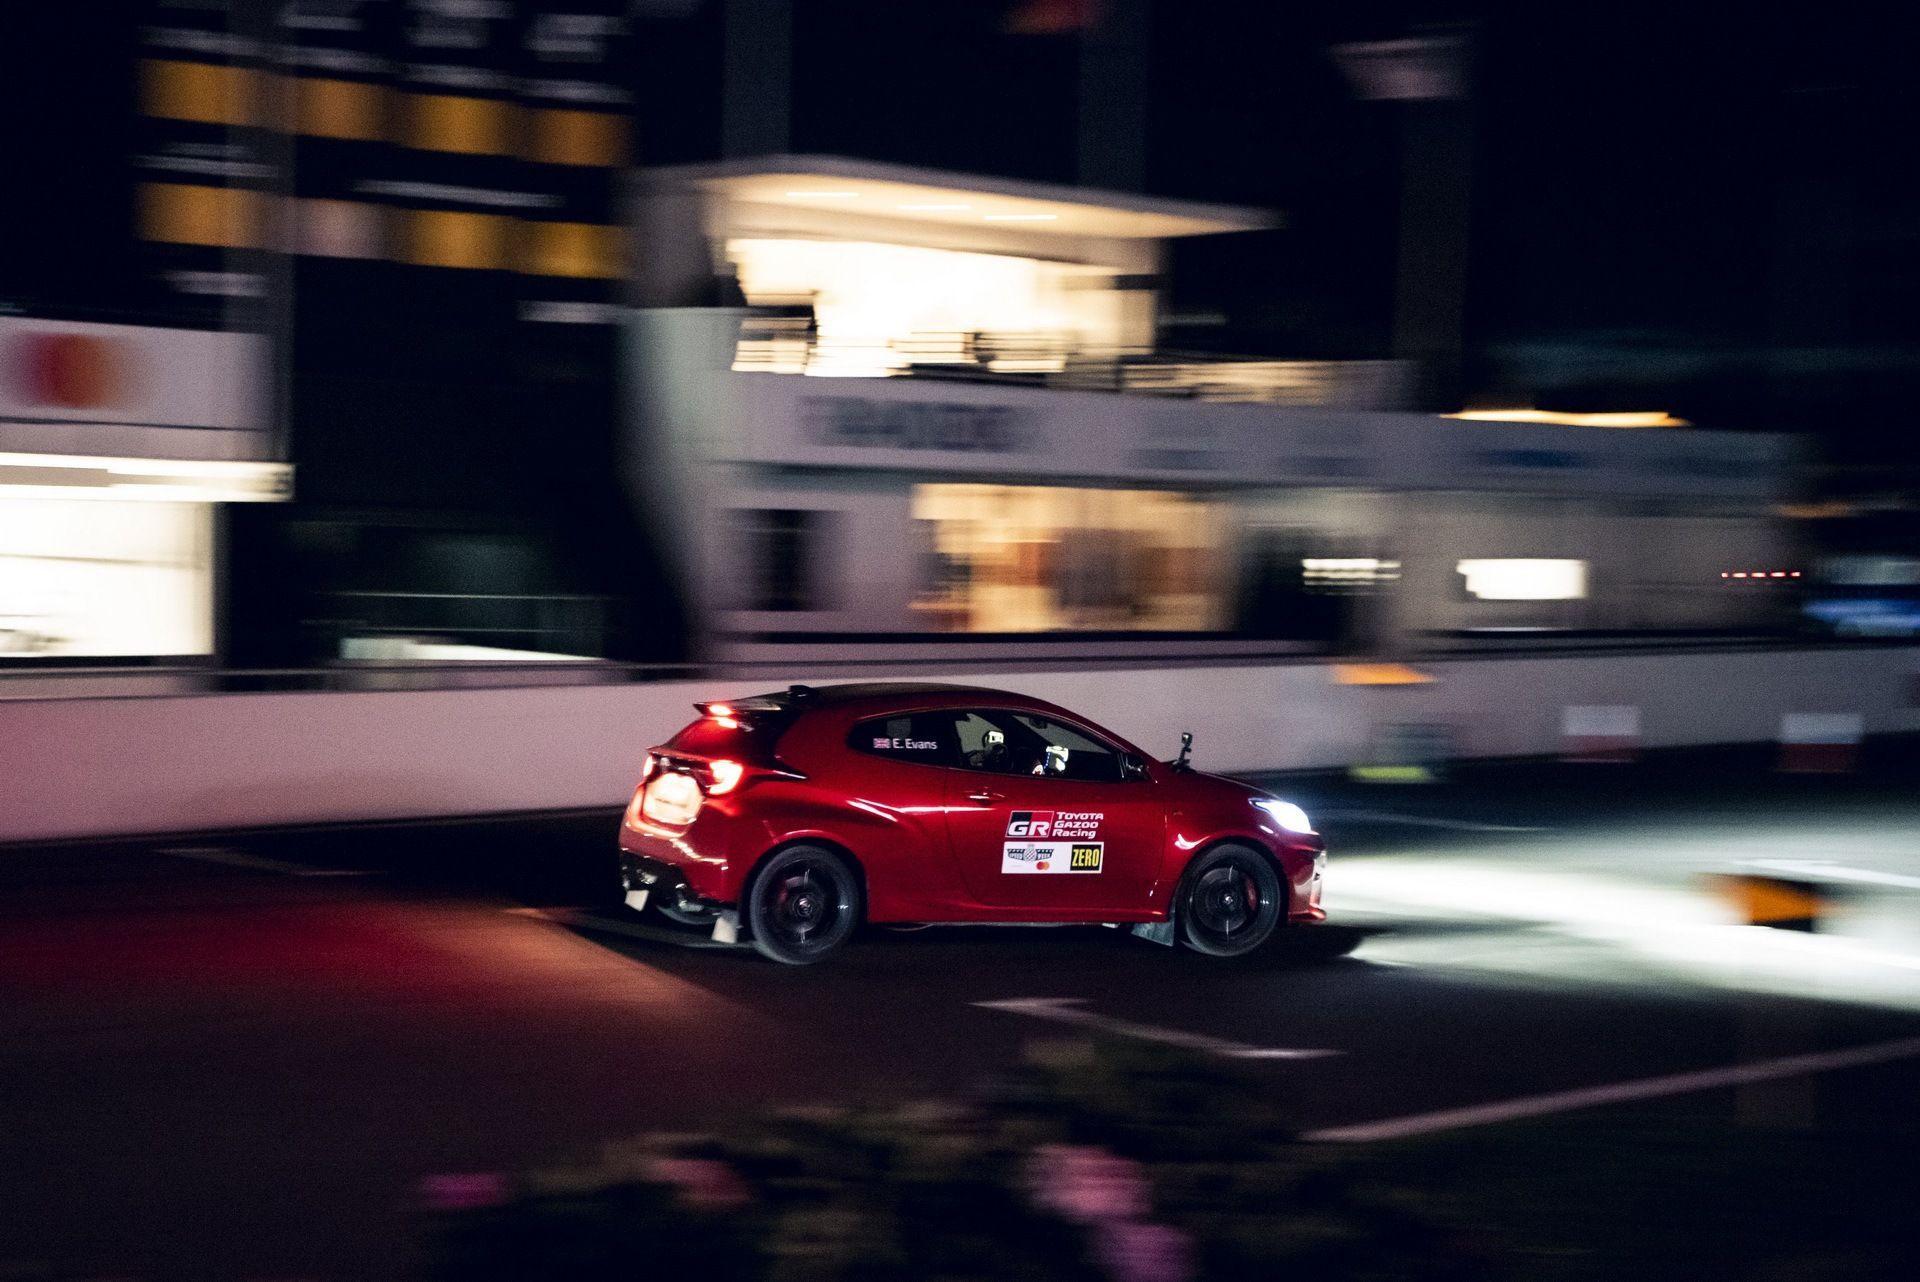 Toyota-GR-Yaris-Goodwood-26